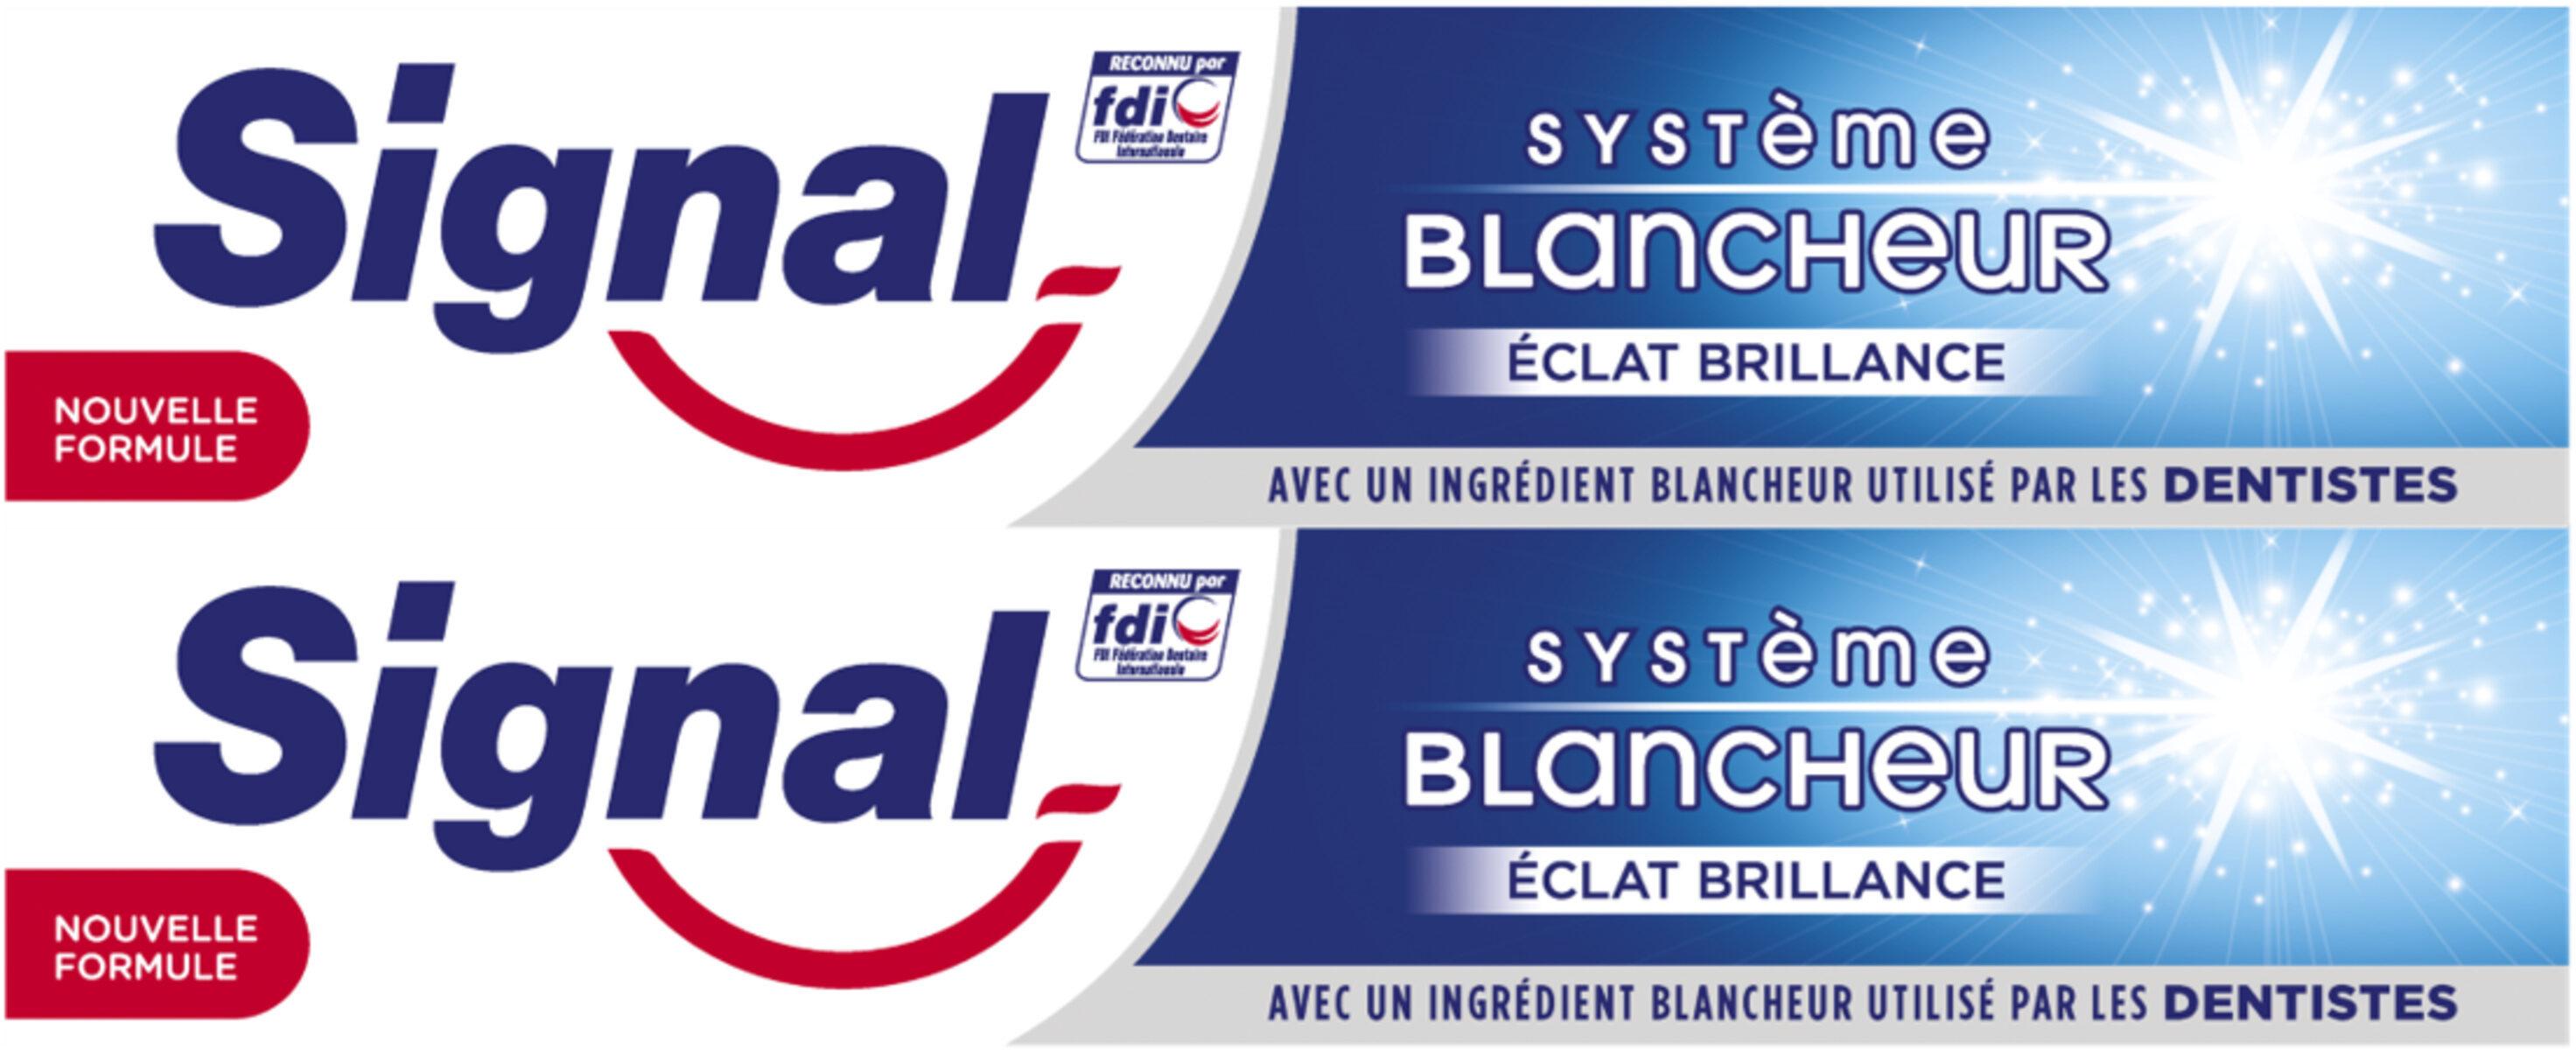 Signal Dentifrice Système Blancheur Éclat Brillance 2x75ml - Produto - fr